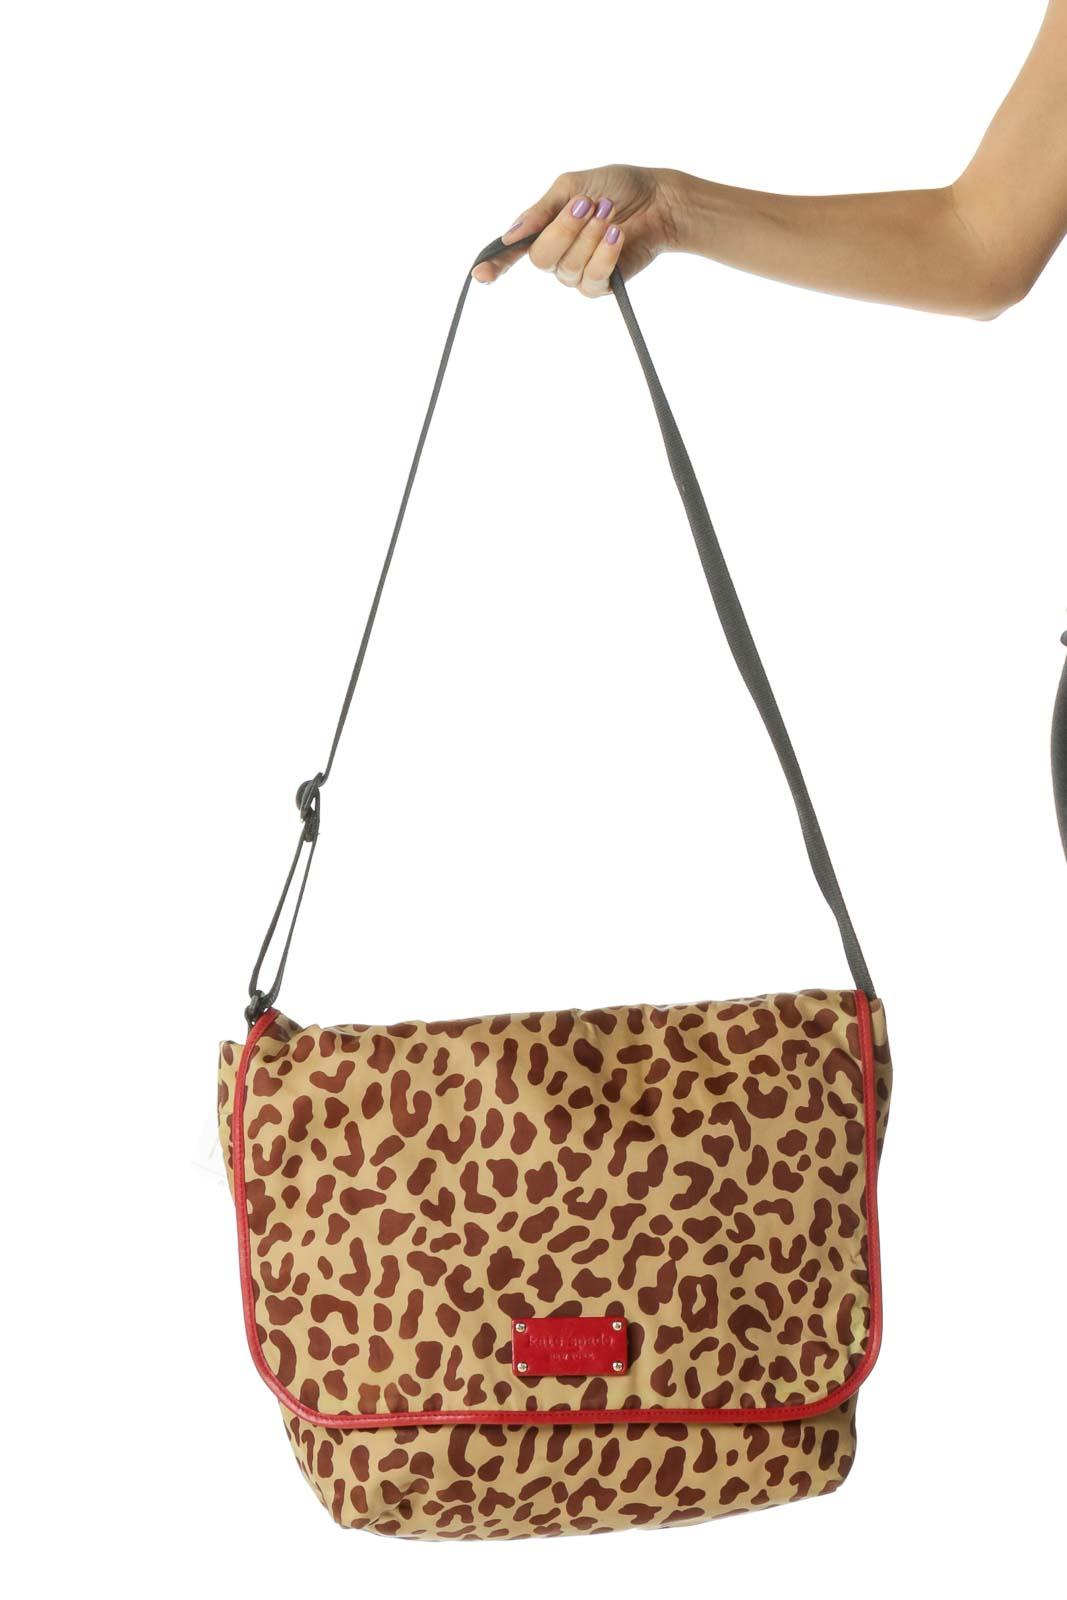 Brown and Red Cheetah Print Messenger Bag Front